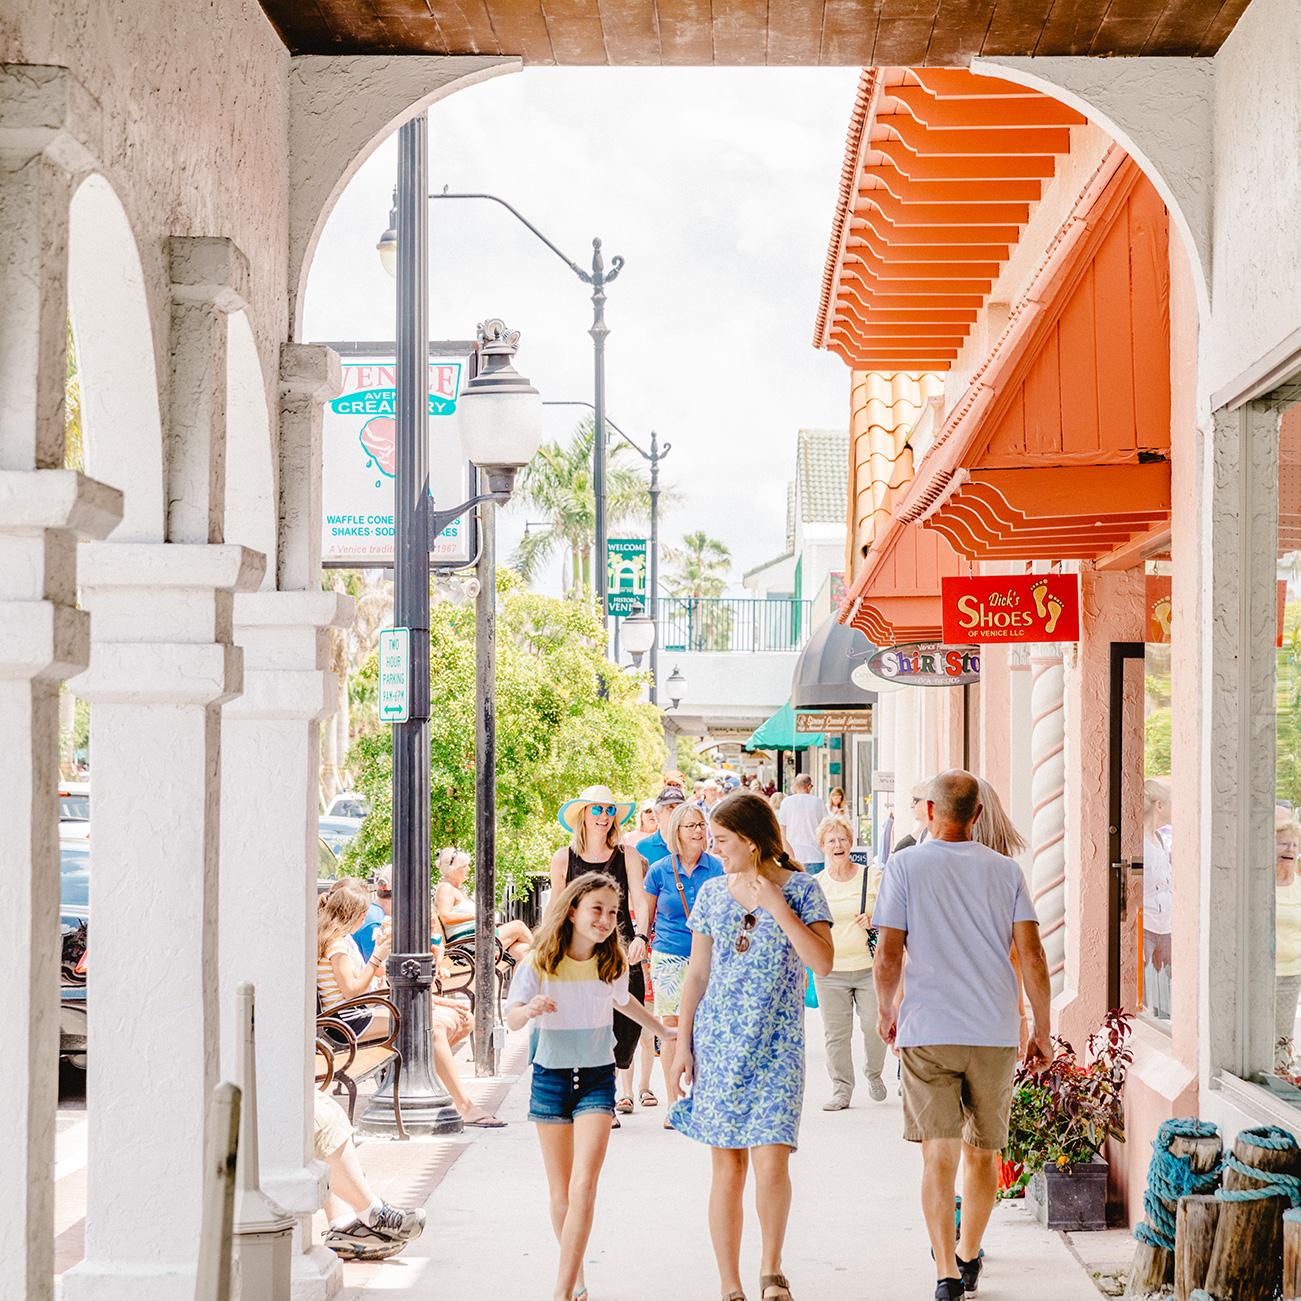 Venice Main Street with walkable shops - Venice Florida